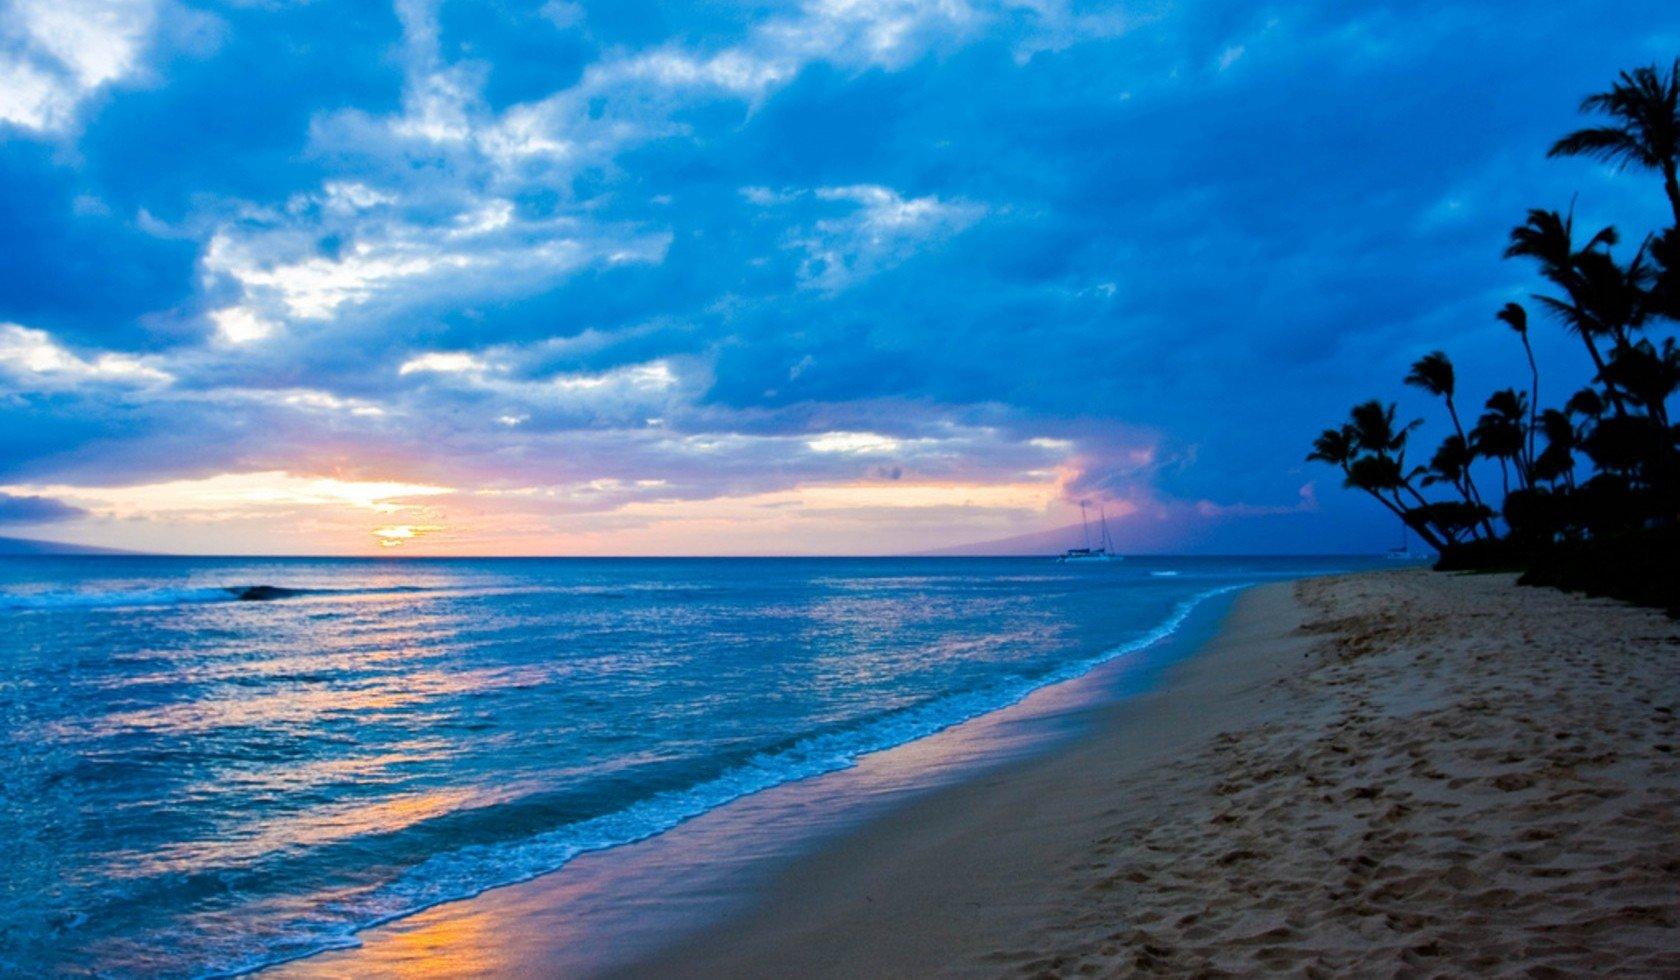 Earth - Sunset  Earth Sky Blue Cloud Tropical Beach Palm Tree Ocean Horizon Wallpaper